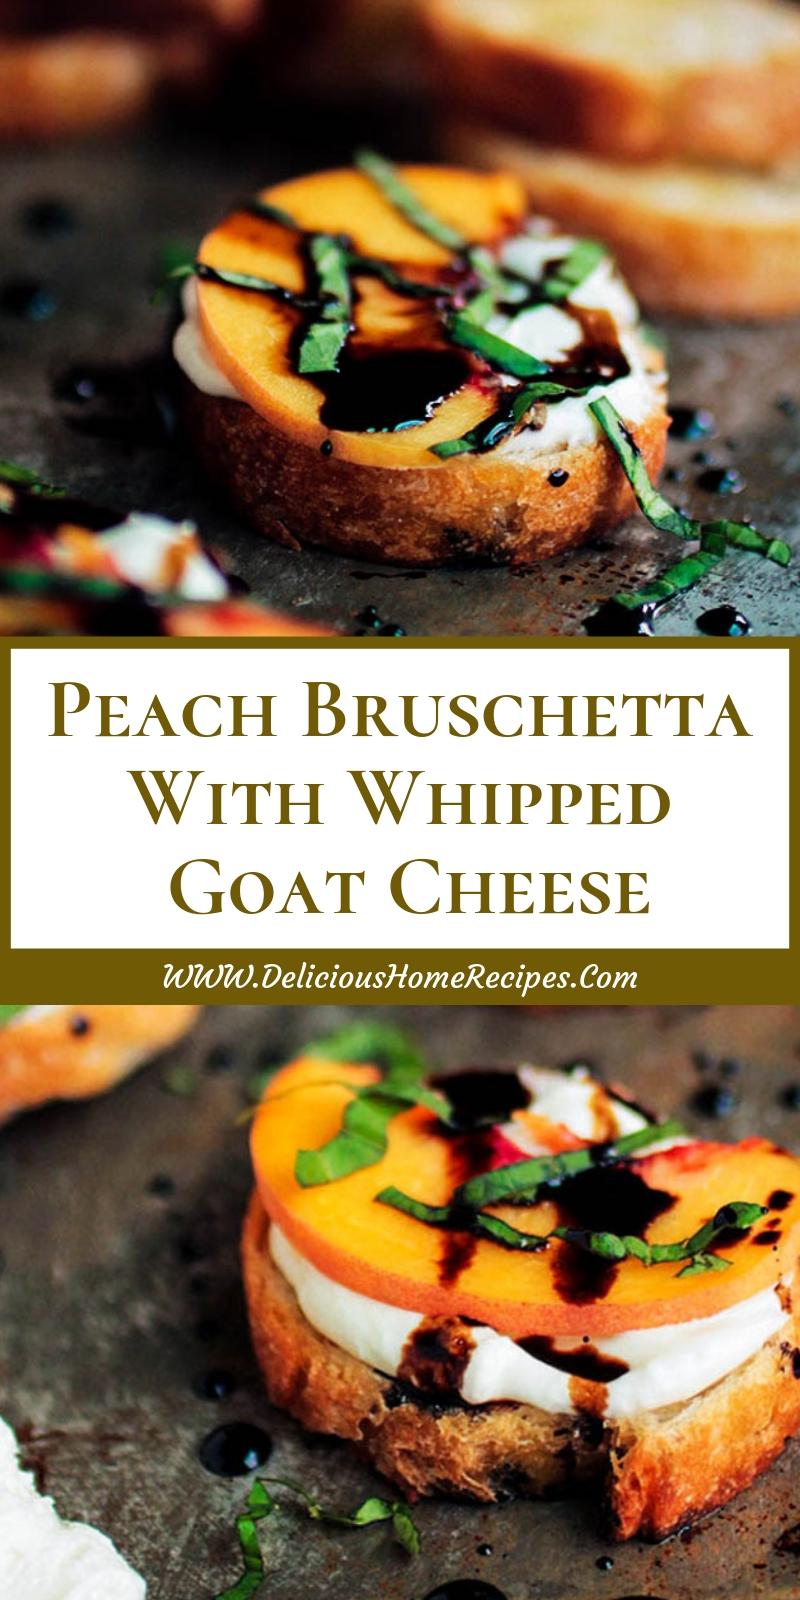 Peach Bruschetta With Whipped Goat Cheese